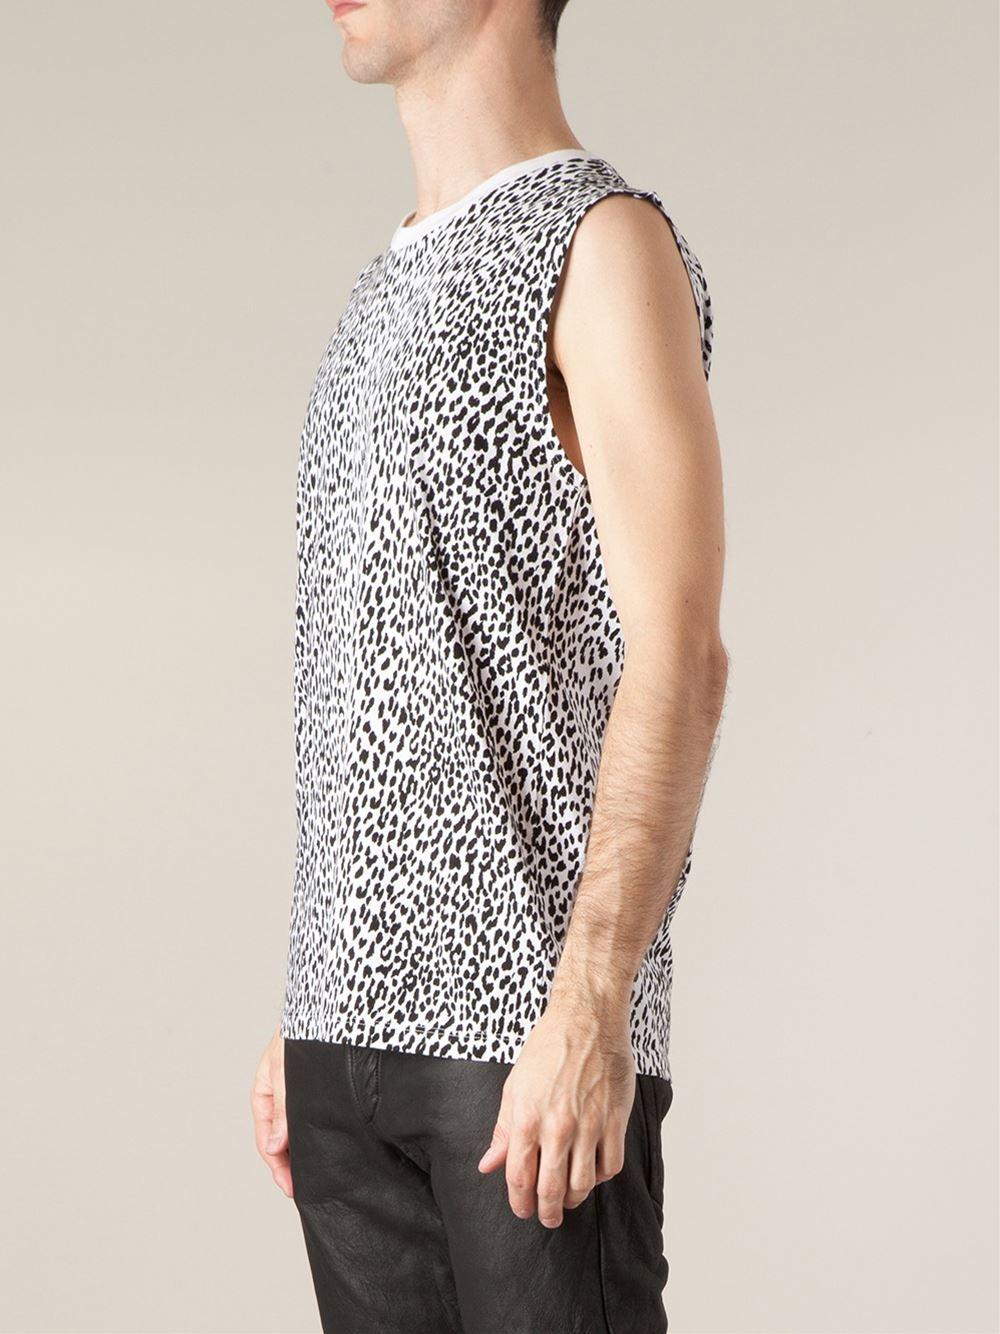 e7f68302caf3a Lyst - Saint Laurent Leopard Print Tank Top in Black for Men